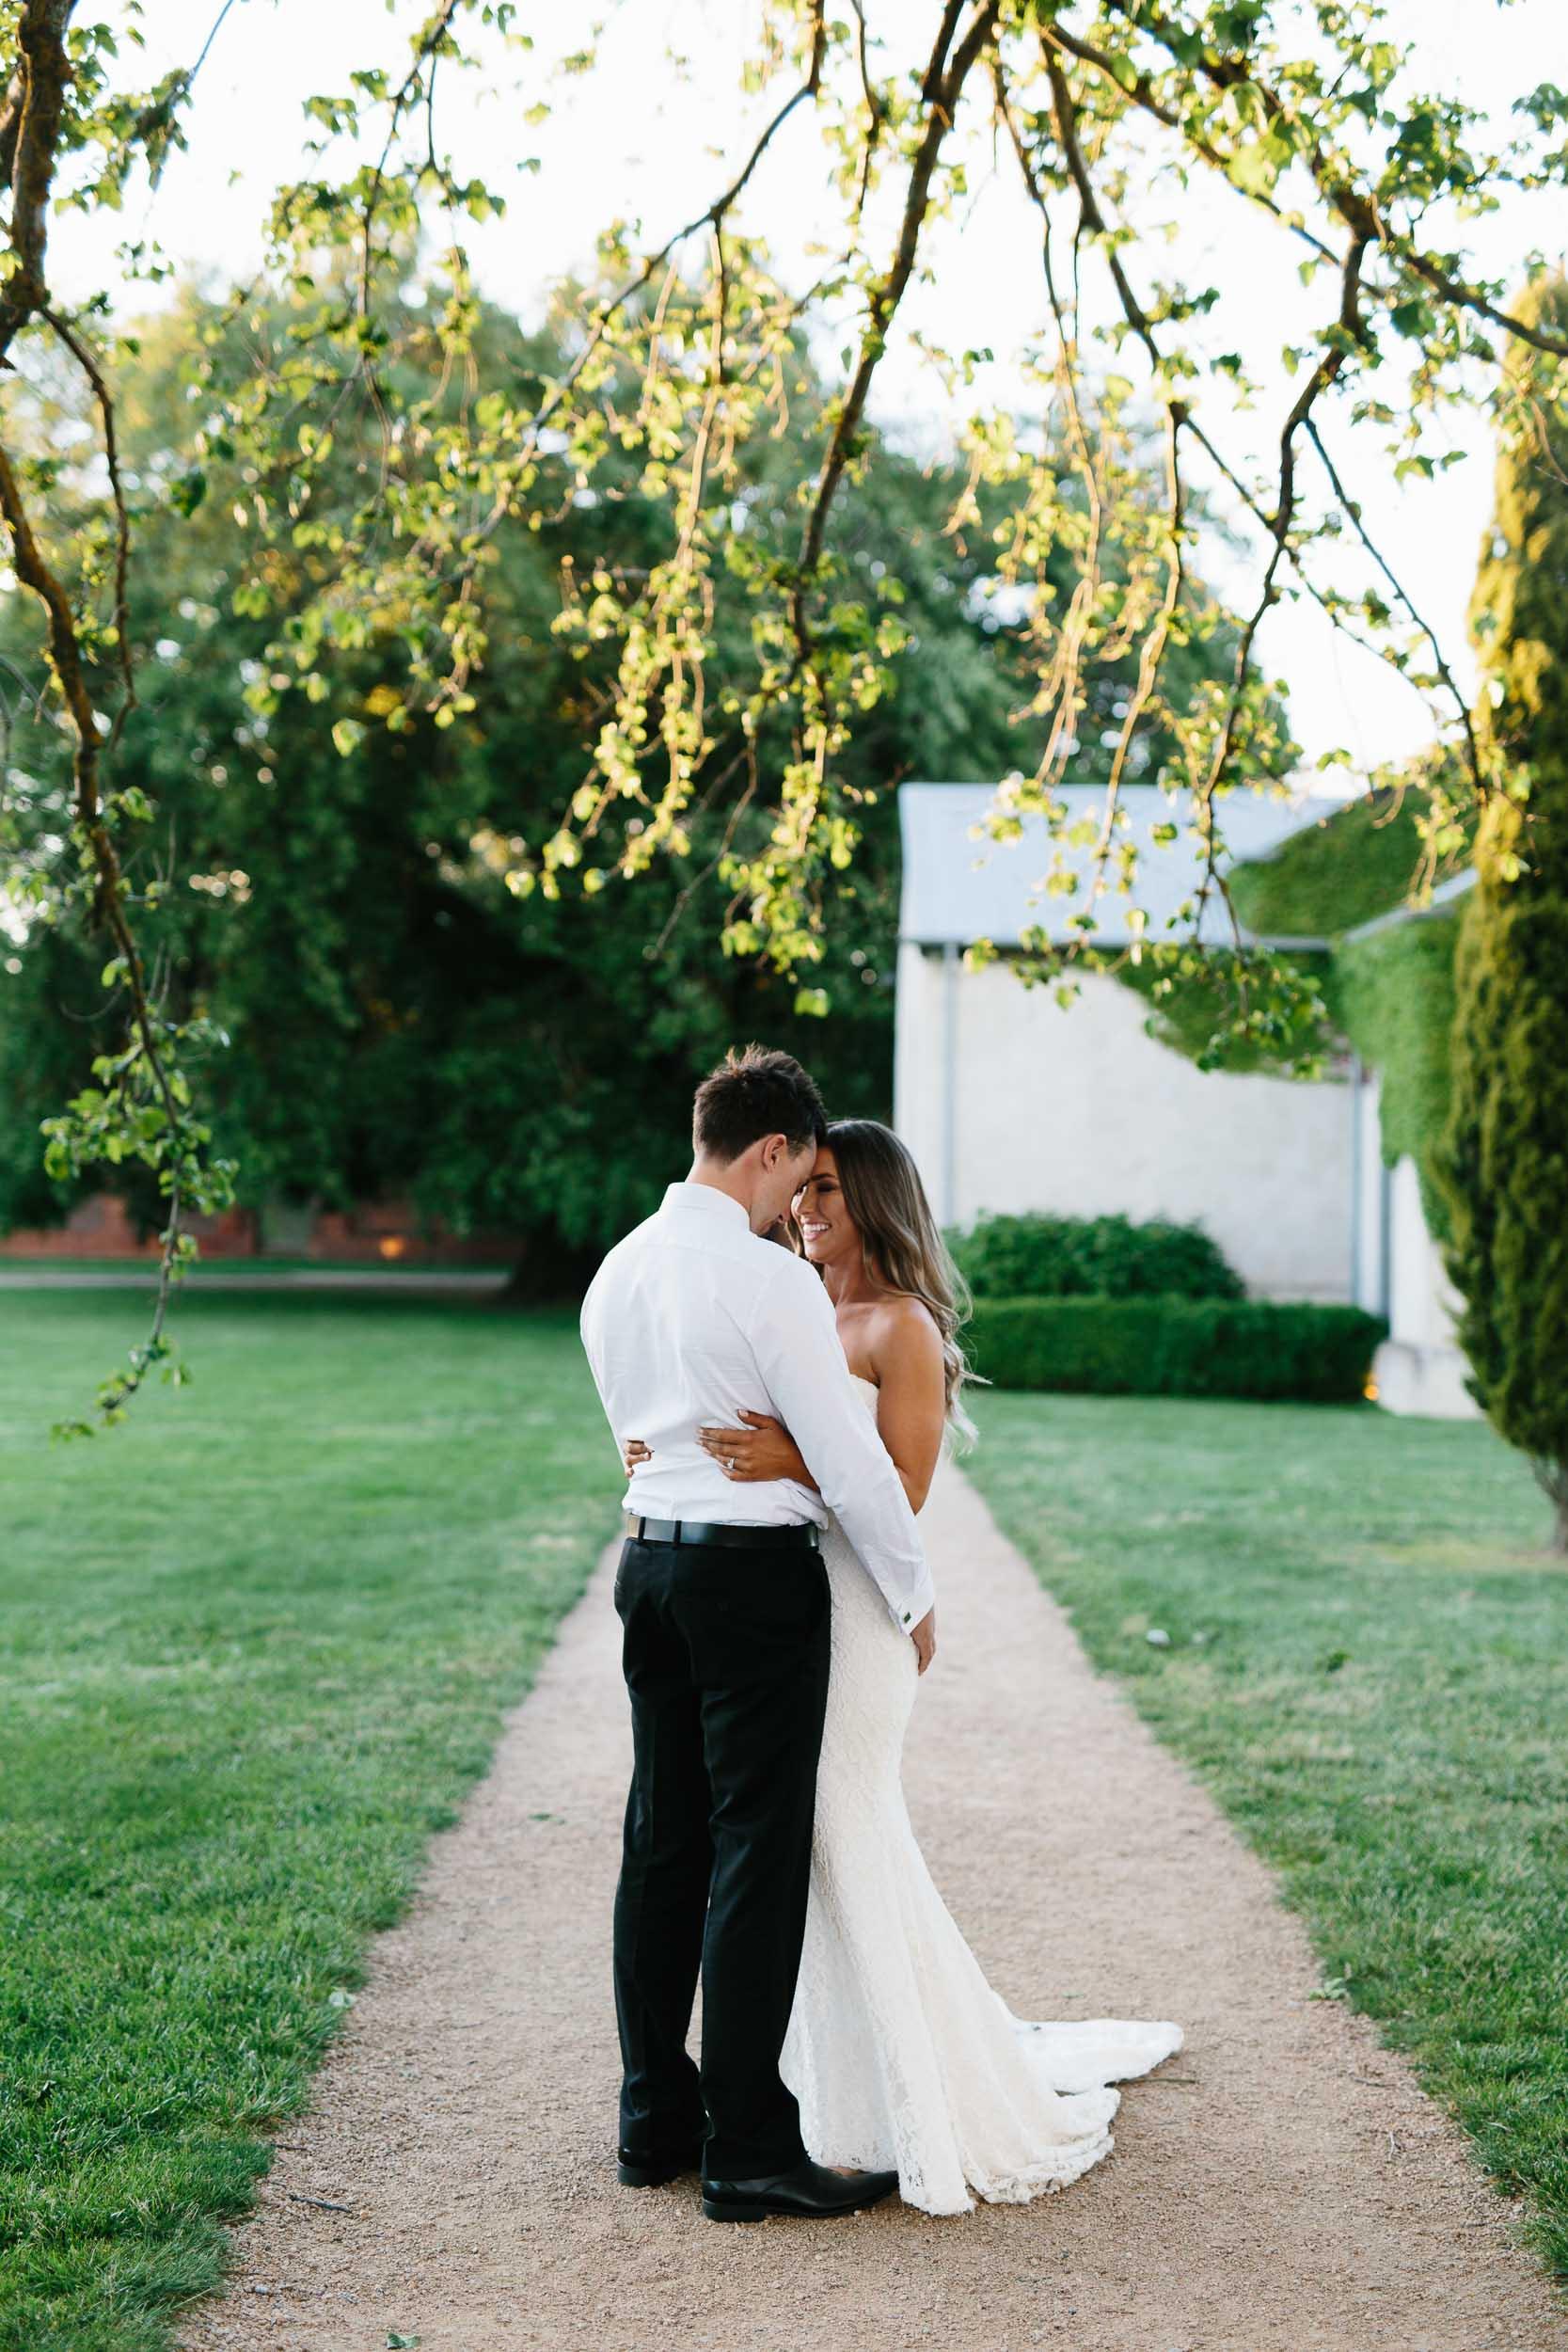 Kas-Richards-Stones-of-the-Yarra-Valley-Wedding-811.jpg